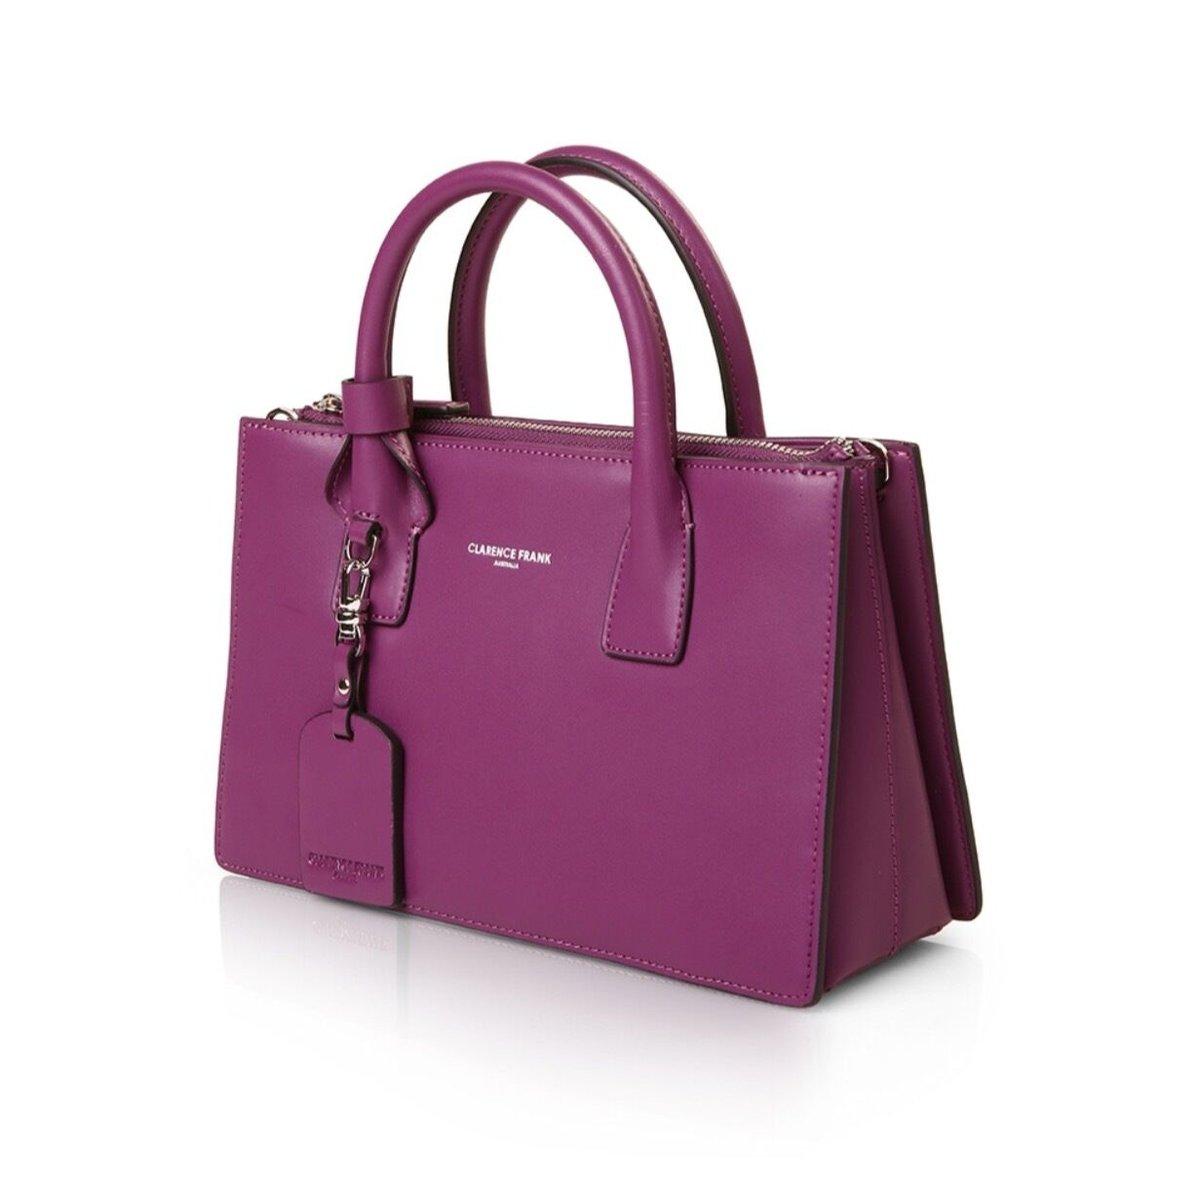 Image of Jasmin Tote - Tan, Purple, Pink